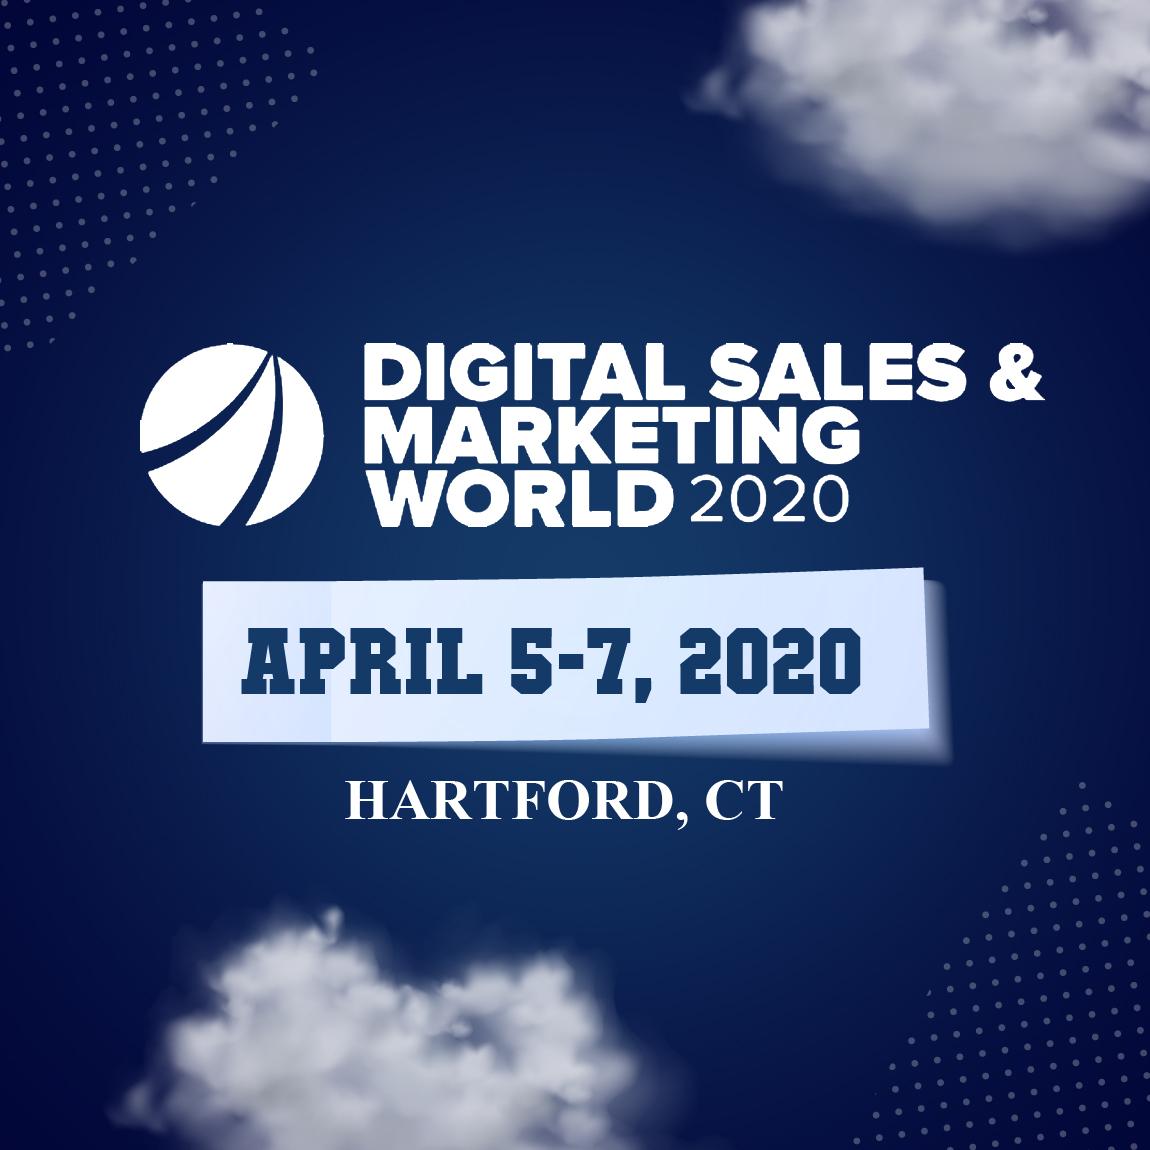 Digital Sales and Marketing World